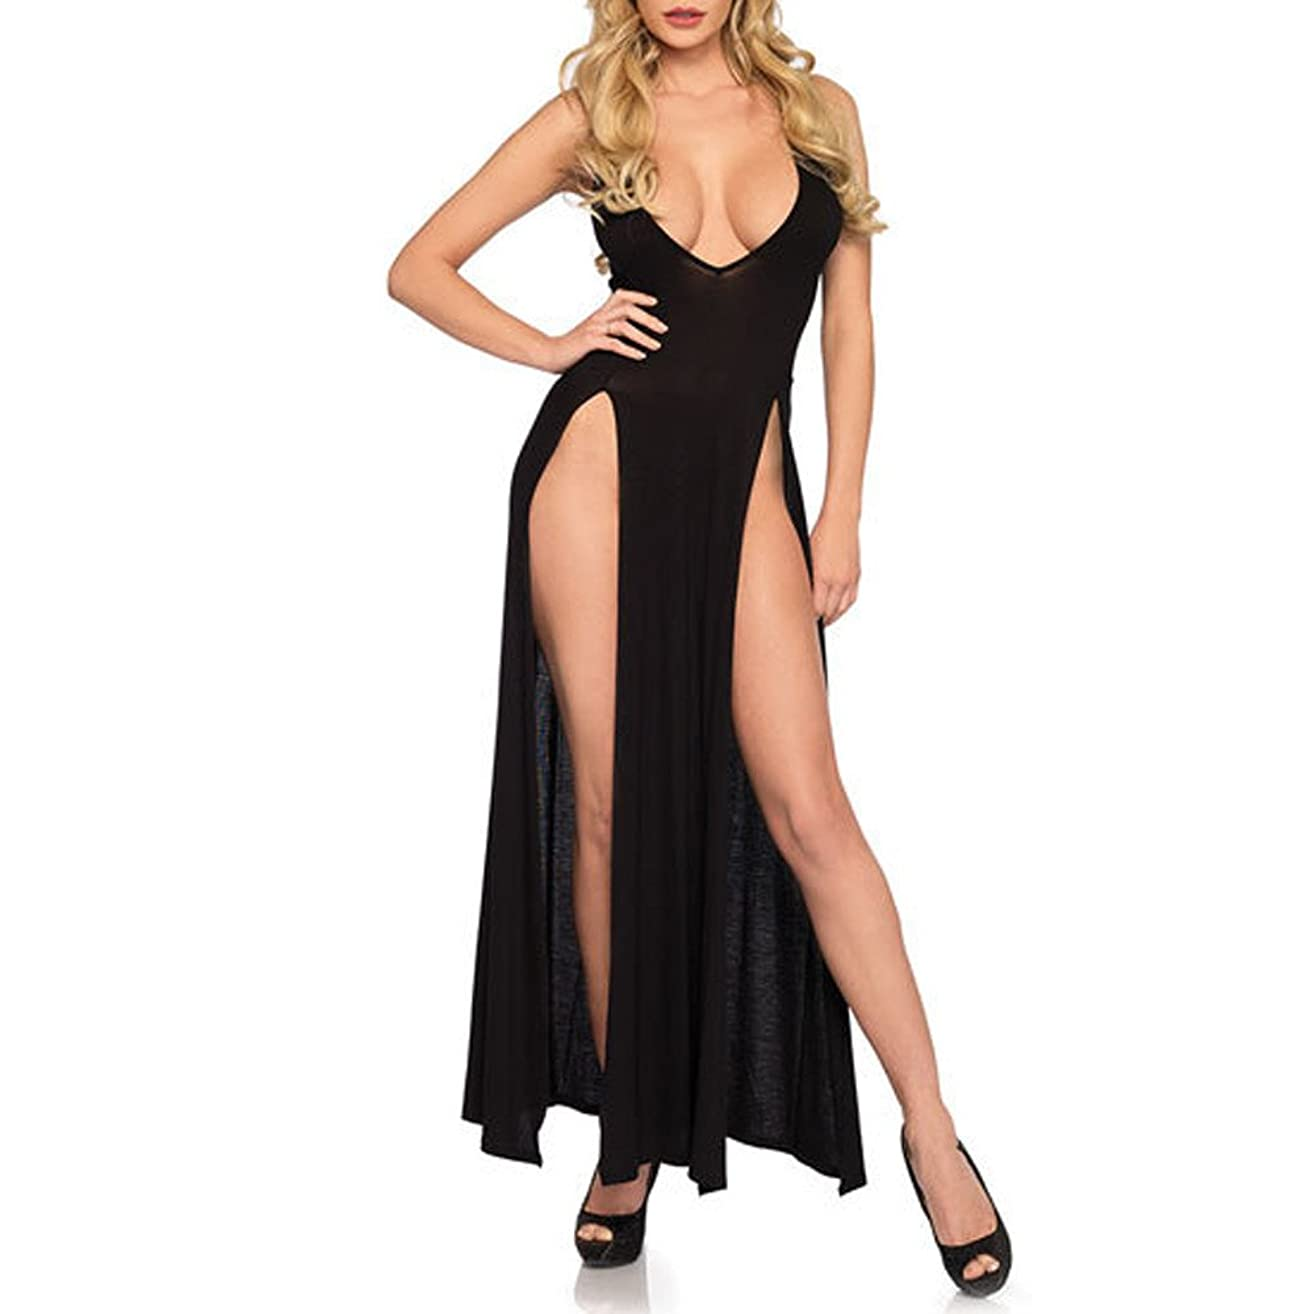 Letdown Women Sexy Plus Size Long Skirt Solid Lingerie Underwear Nightdress Pajamas